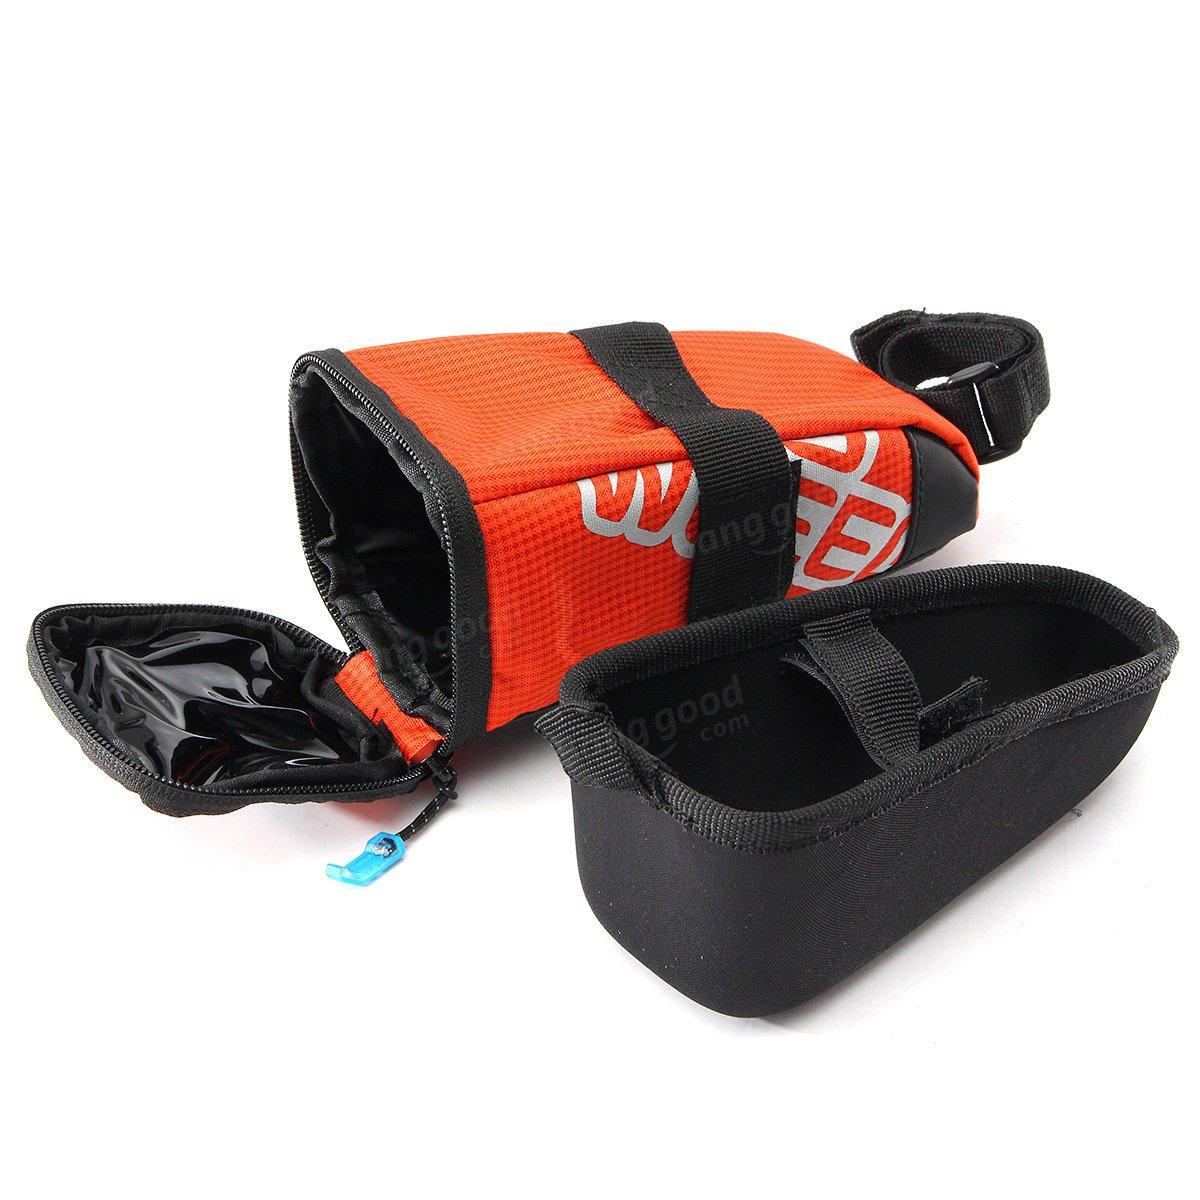 ROSWHEEL Bike Bicycle Saddle Bag Back Seat Tail Pouch EVA Cycling Bag Seatpost ( Orange )